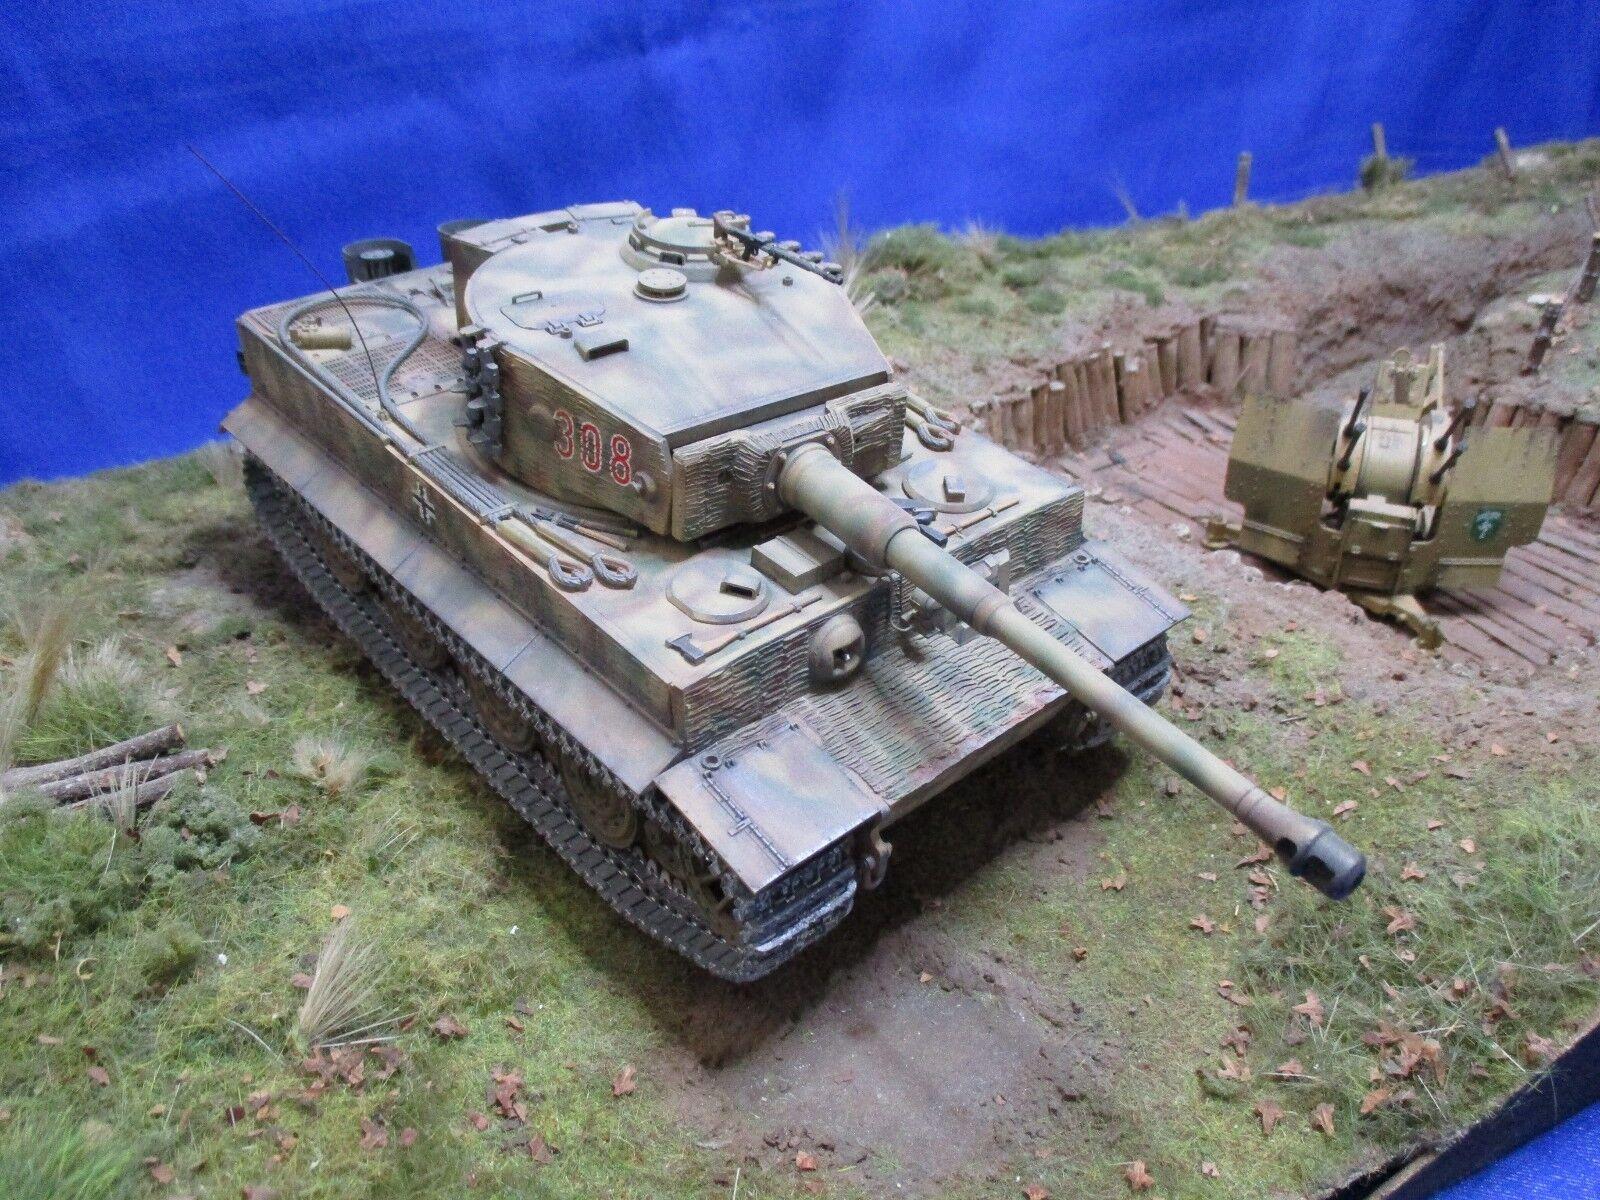 AF008 TAMIYA 35146 1 35 Tigre 1 Panzer Kampfwagen VI Sd Kfz181 Ausfuhrung MONTE